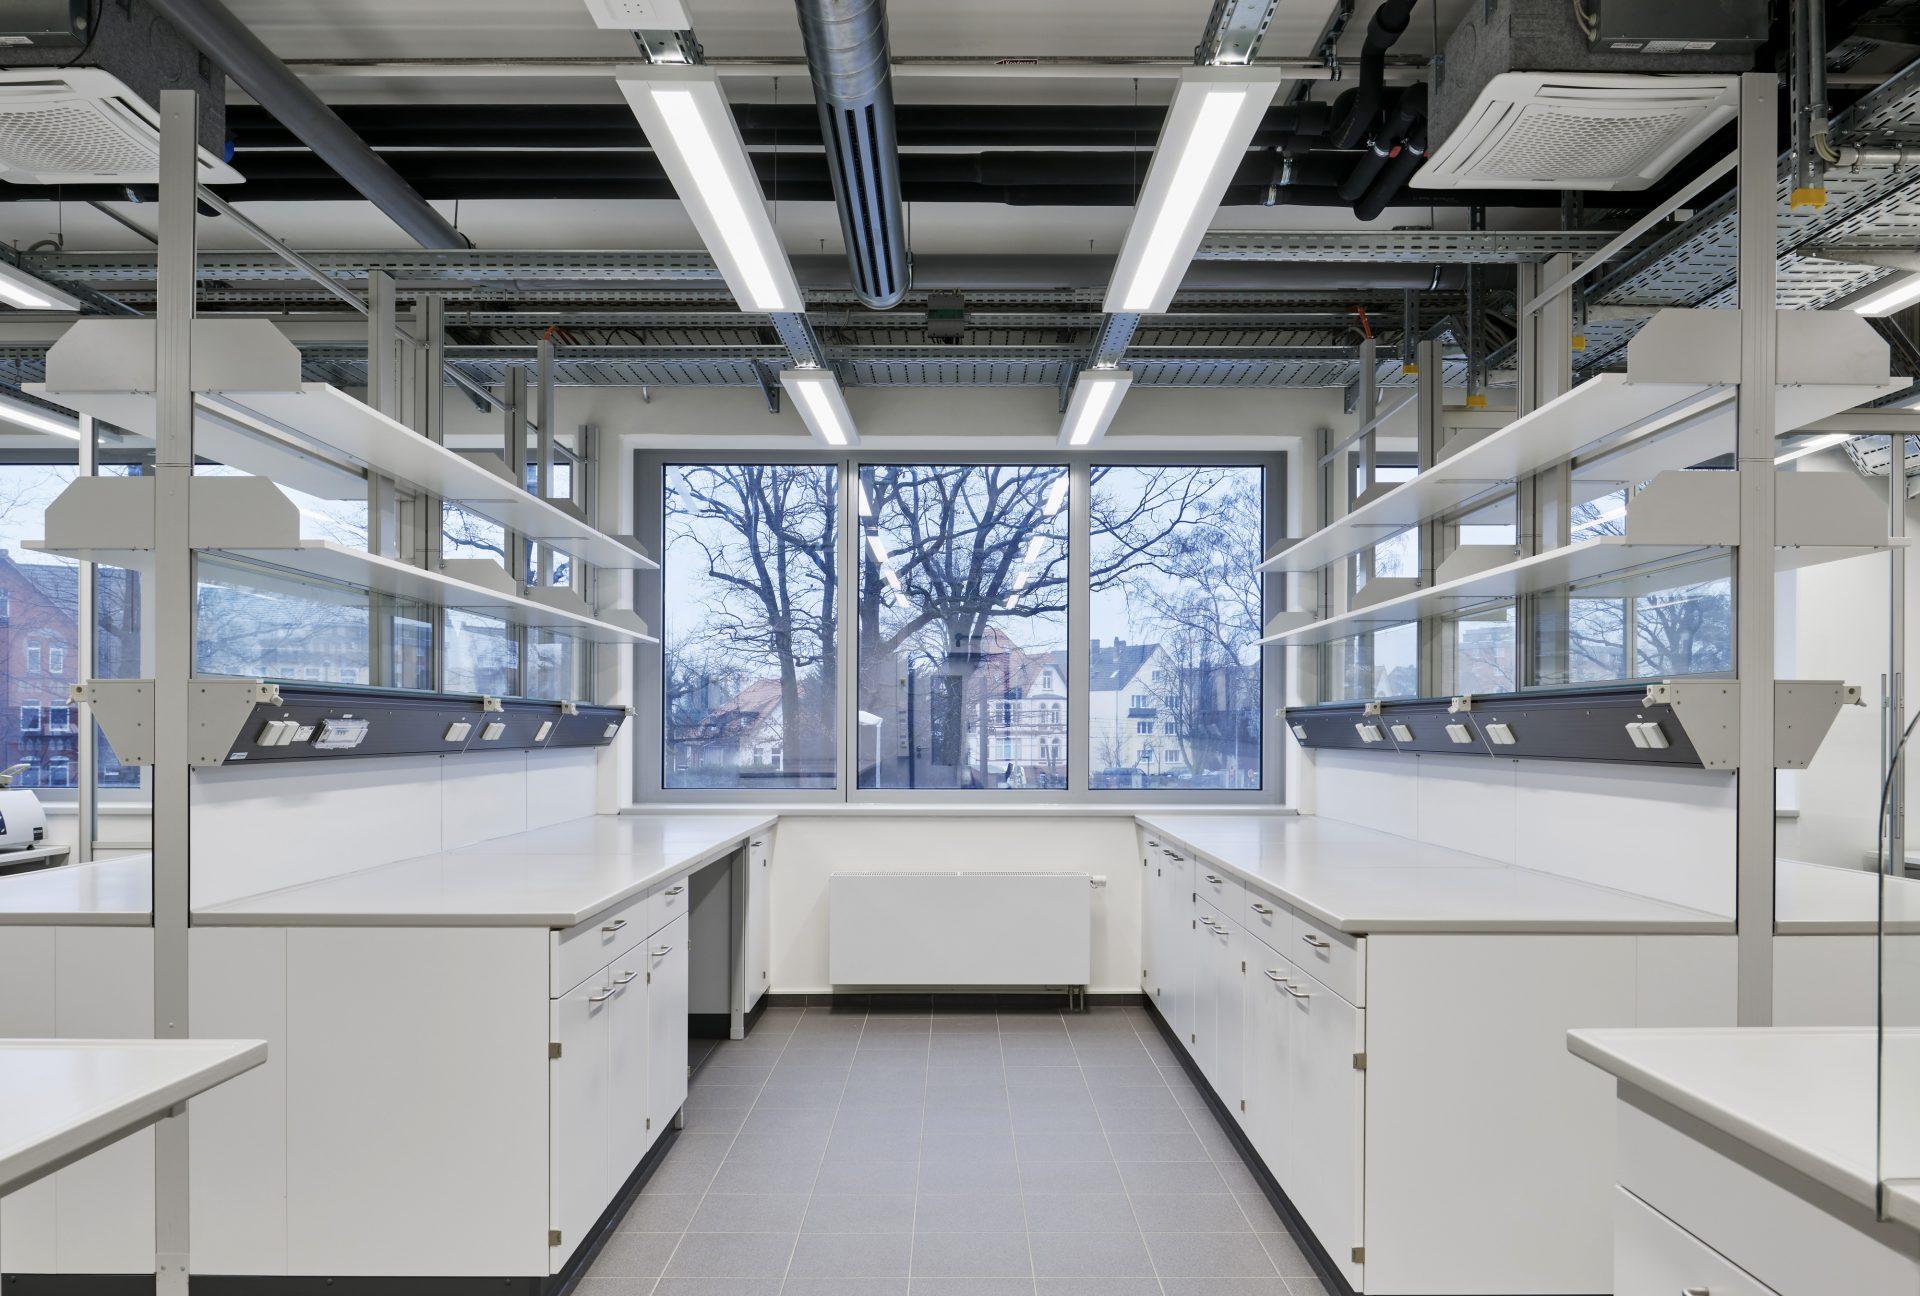 http://www.stricker-architekten.de/projekte/neubau-buero-laborgebaeude-hannover/